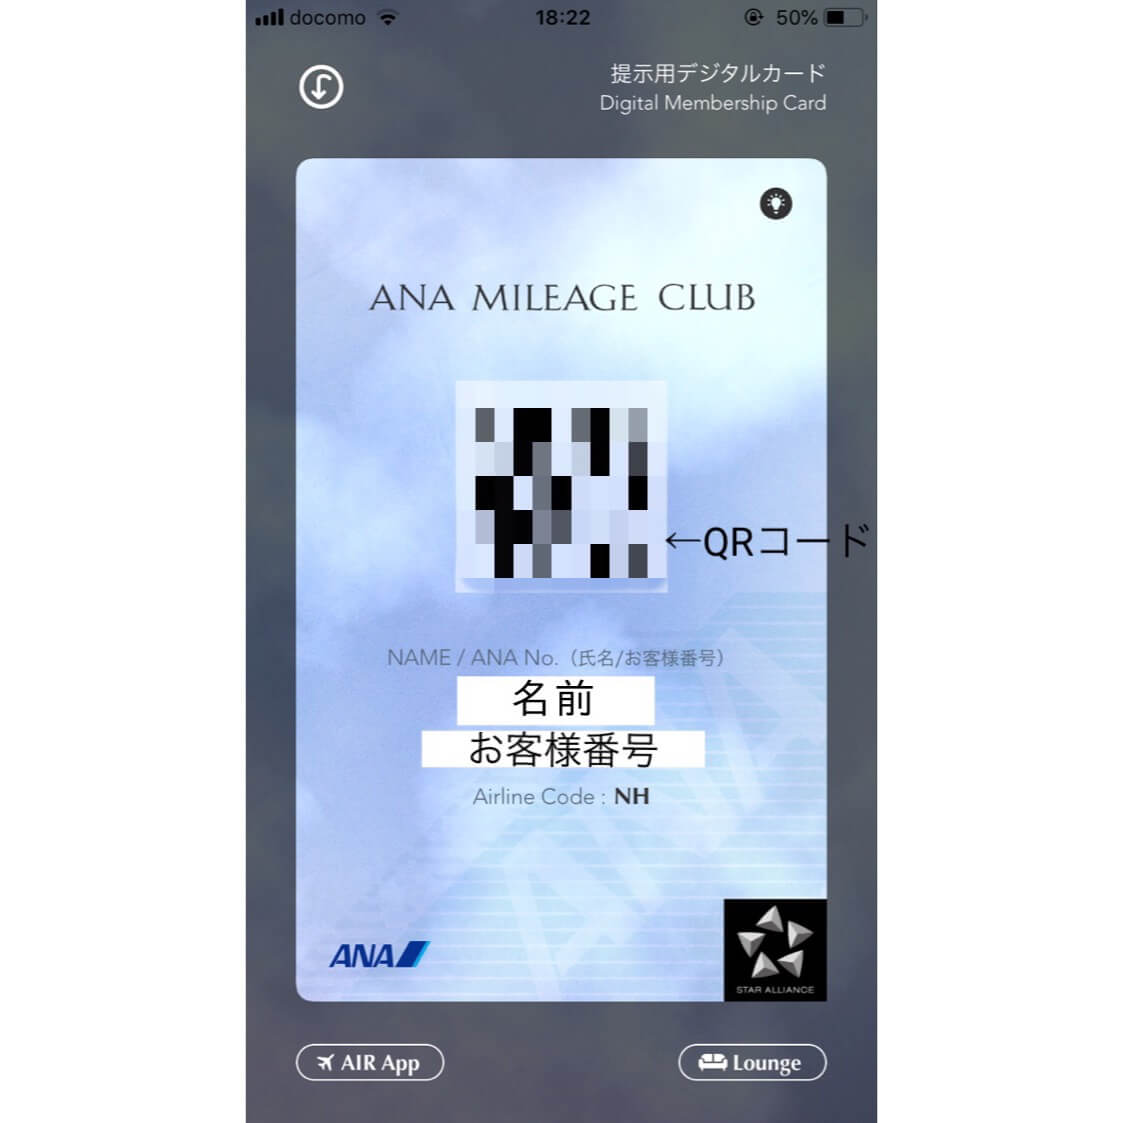 ANAデジタルカード 使い方